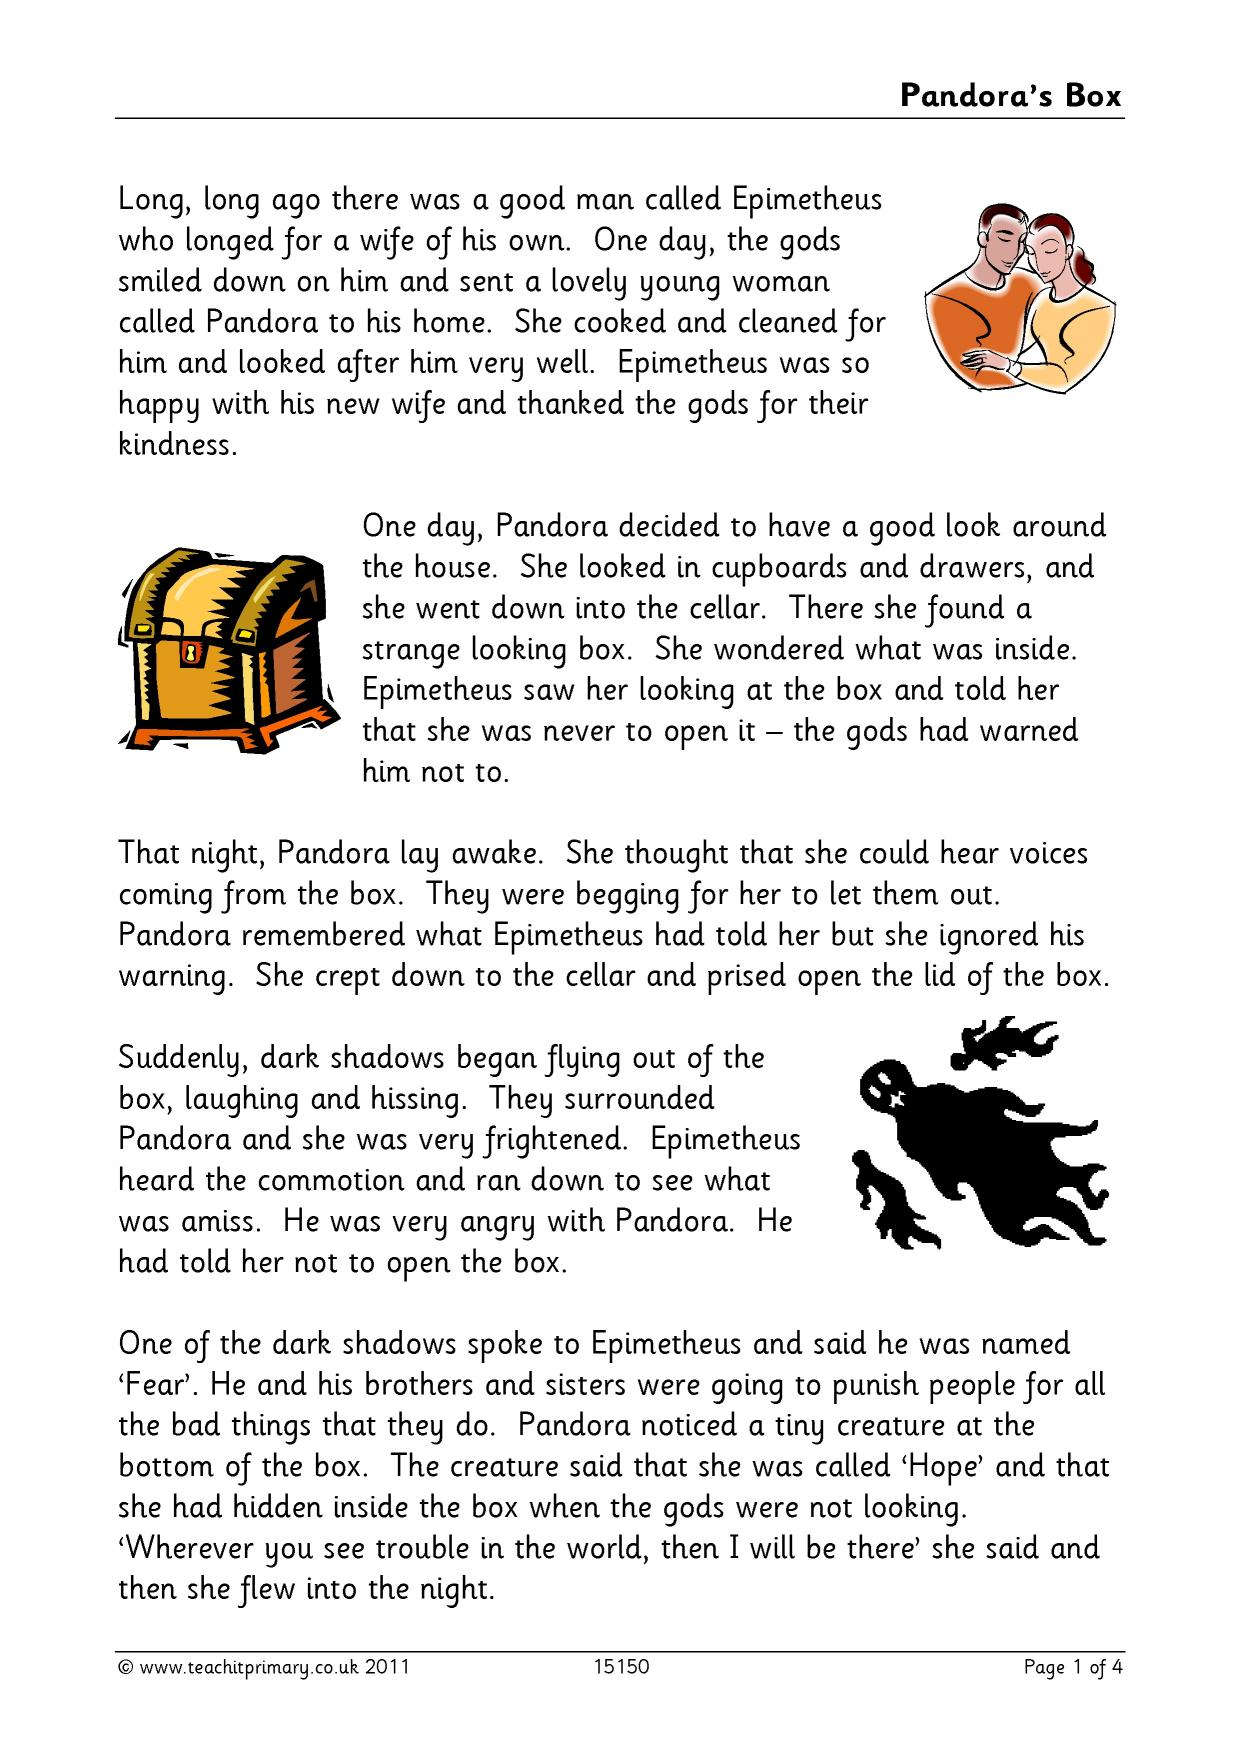 Pandoras box activities